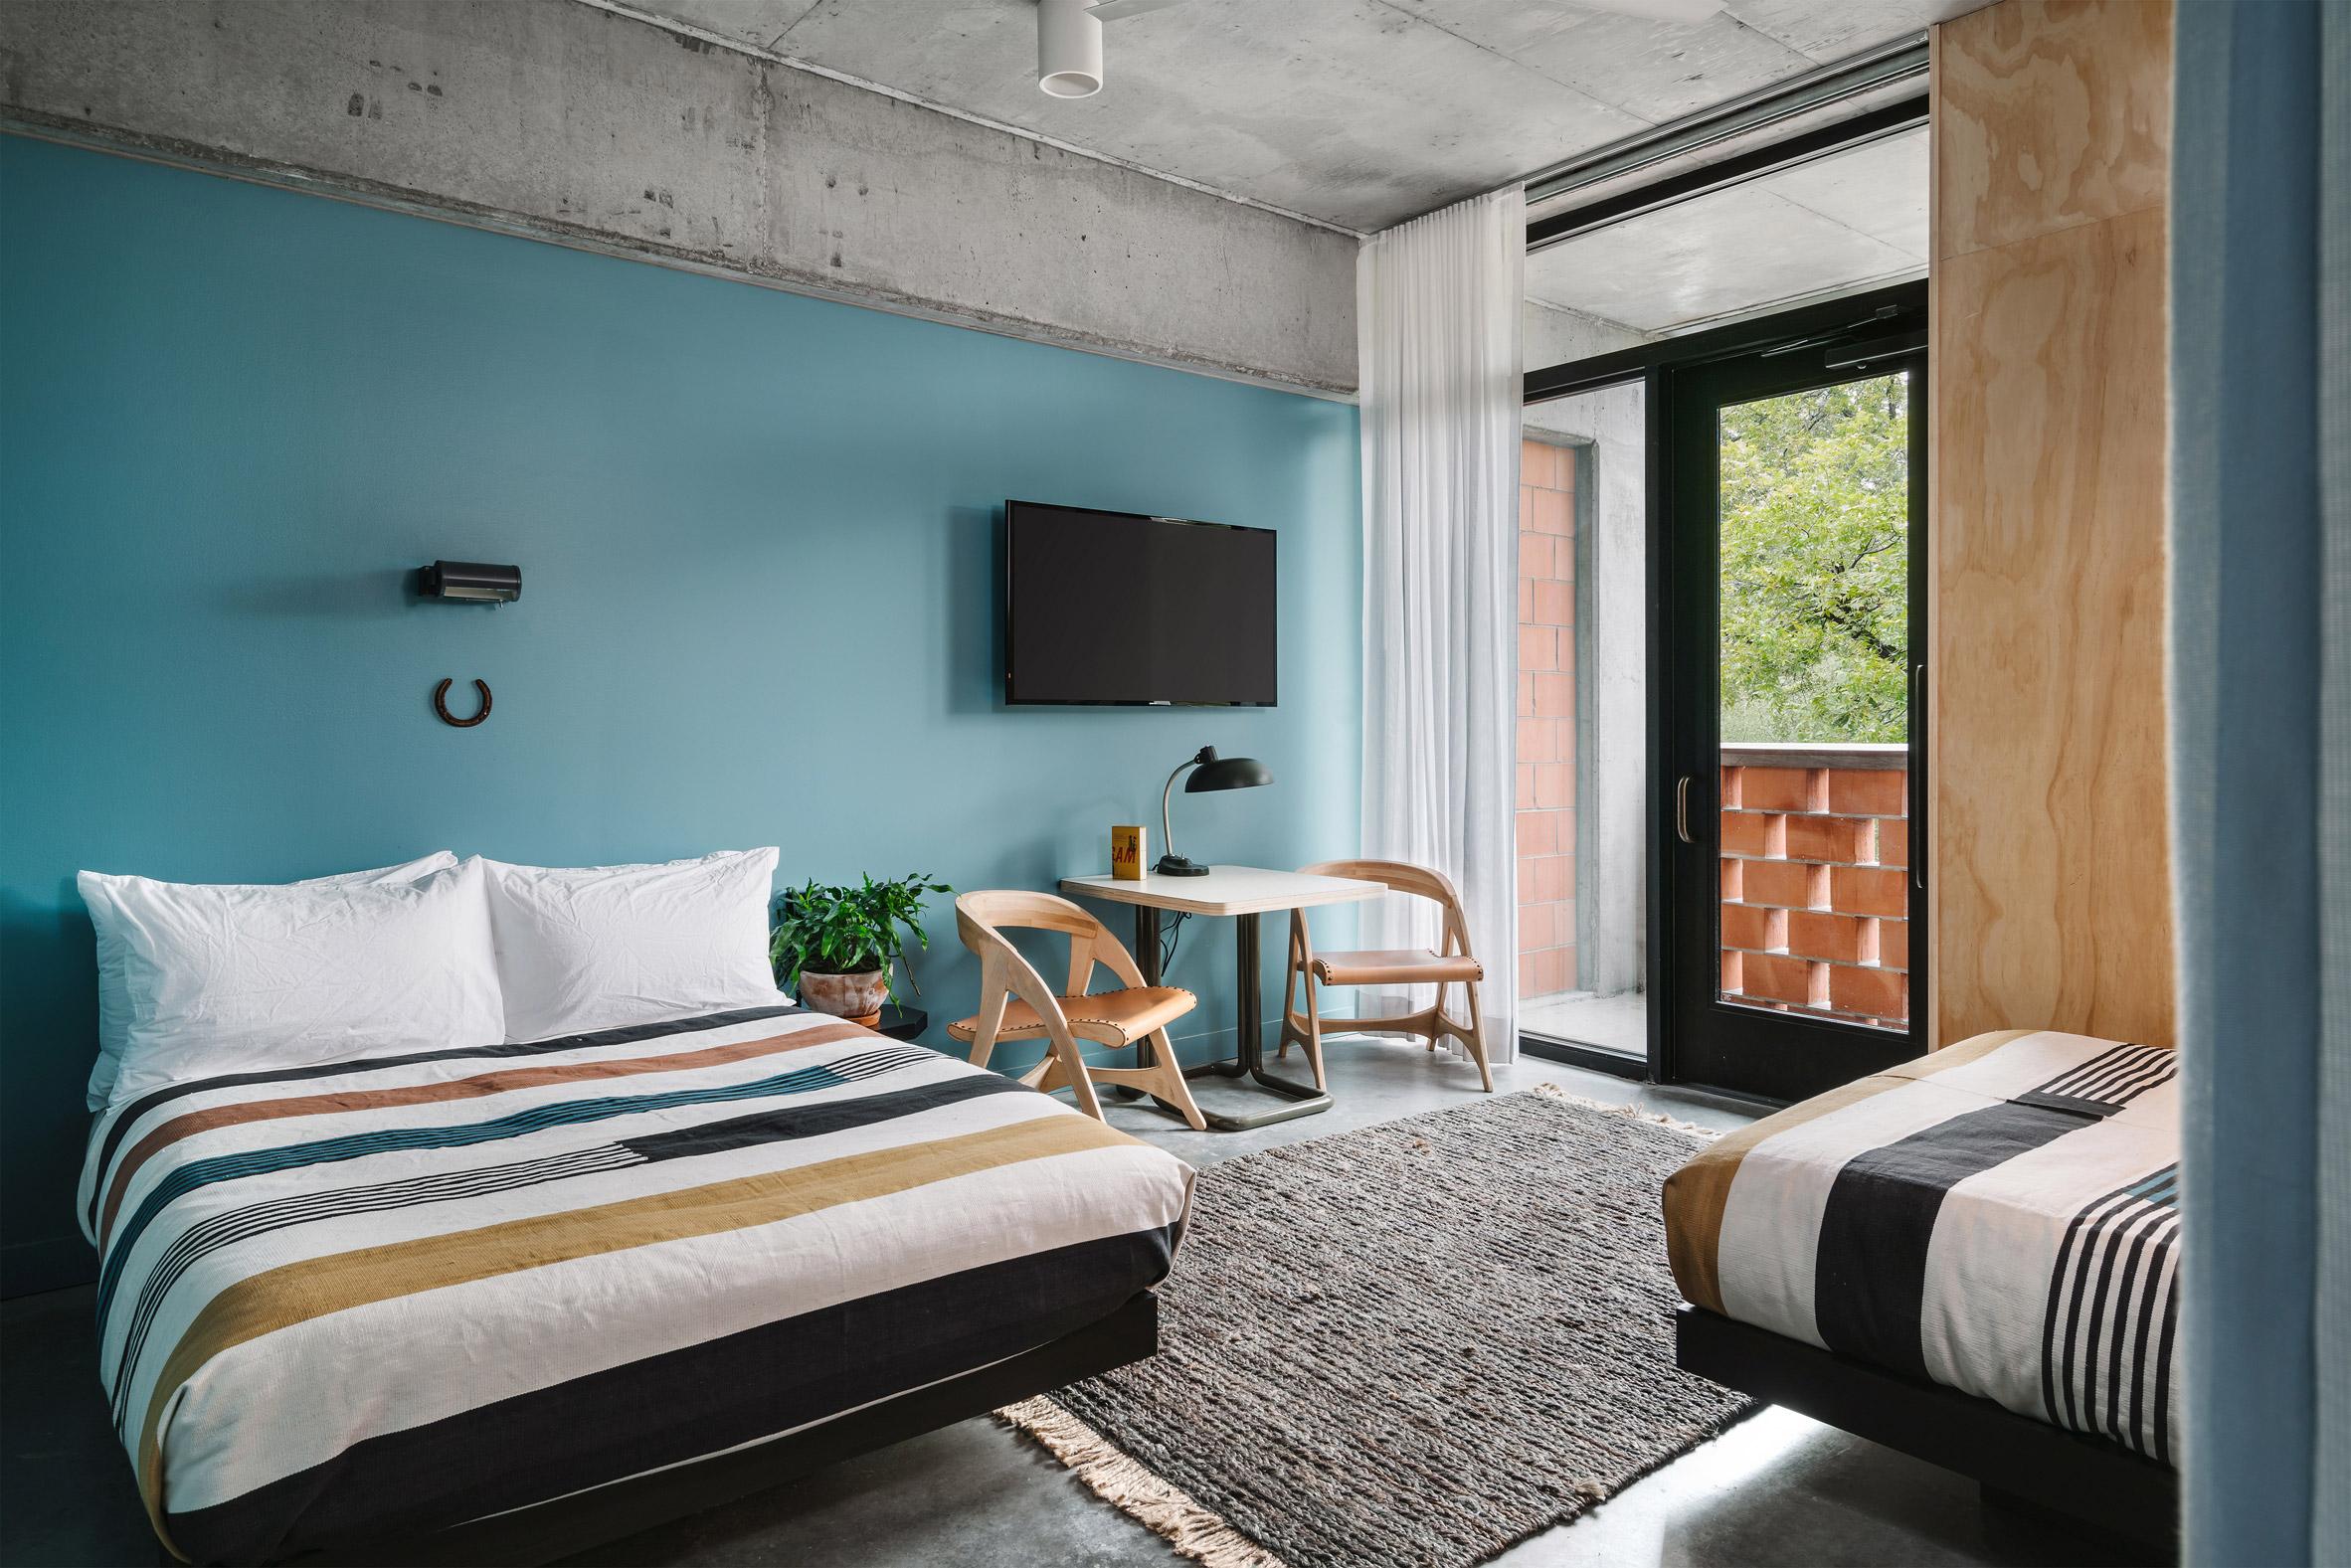 Carpenter Hotel by Specht Architects